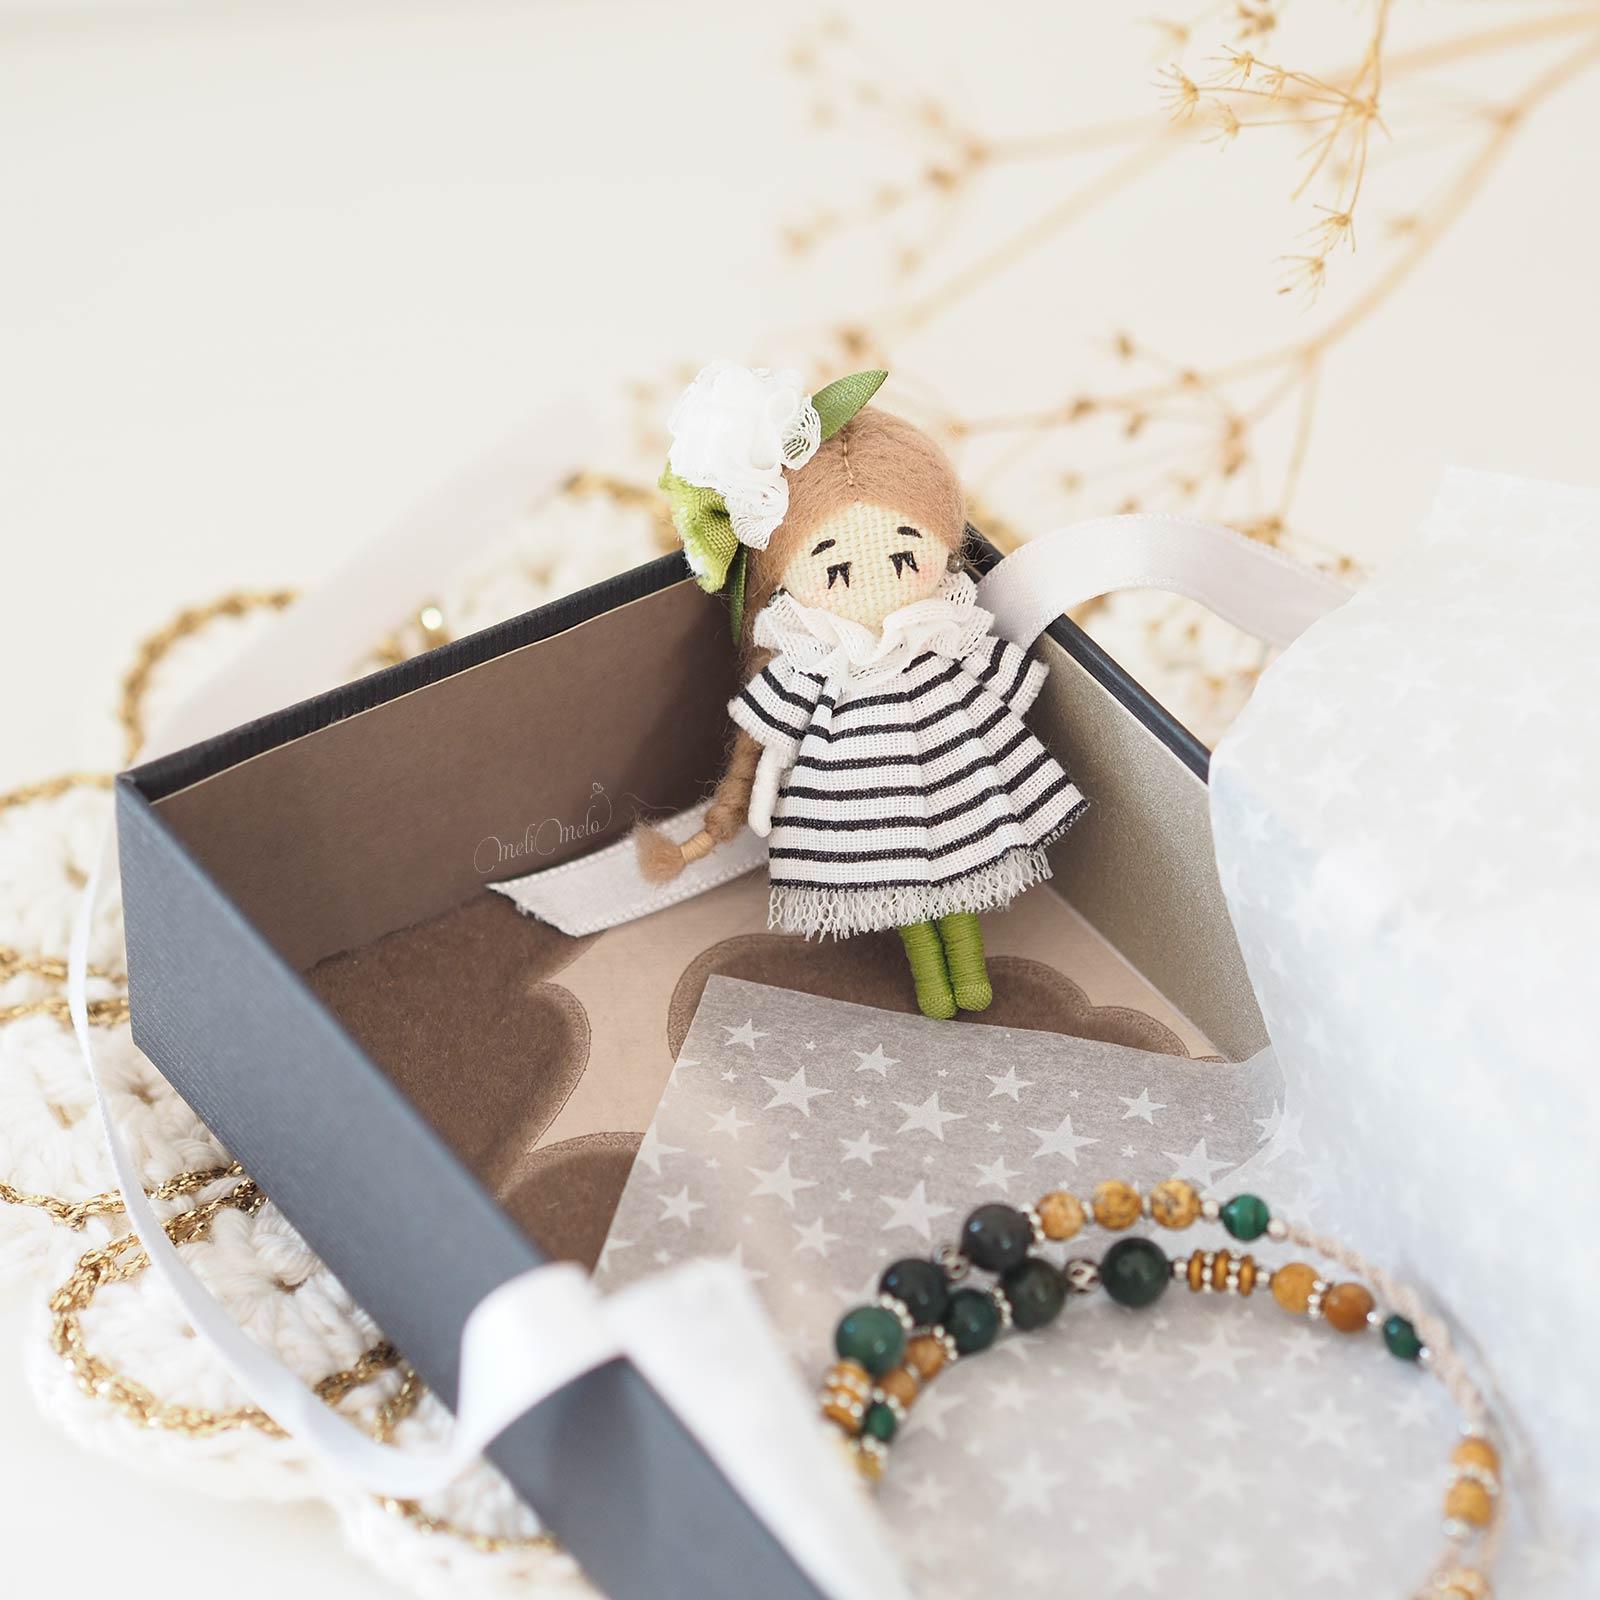 artisanat-poupee-mariniere-bracelet-macrame-mookaite-jaspe-pierres-fines-laboutiquedemelimelo